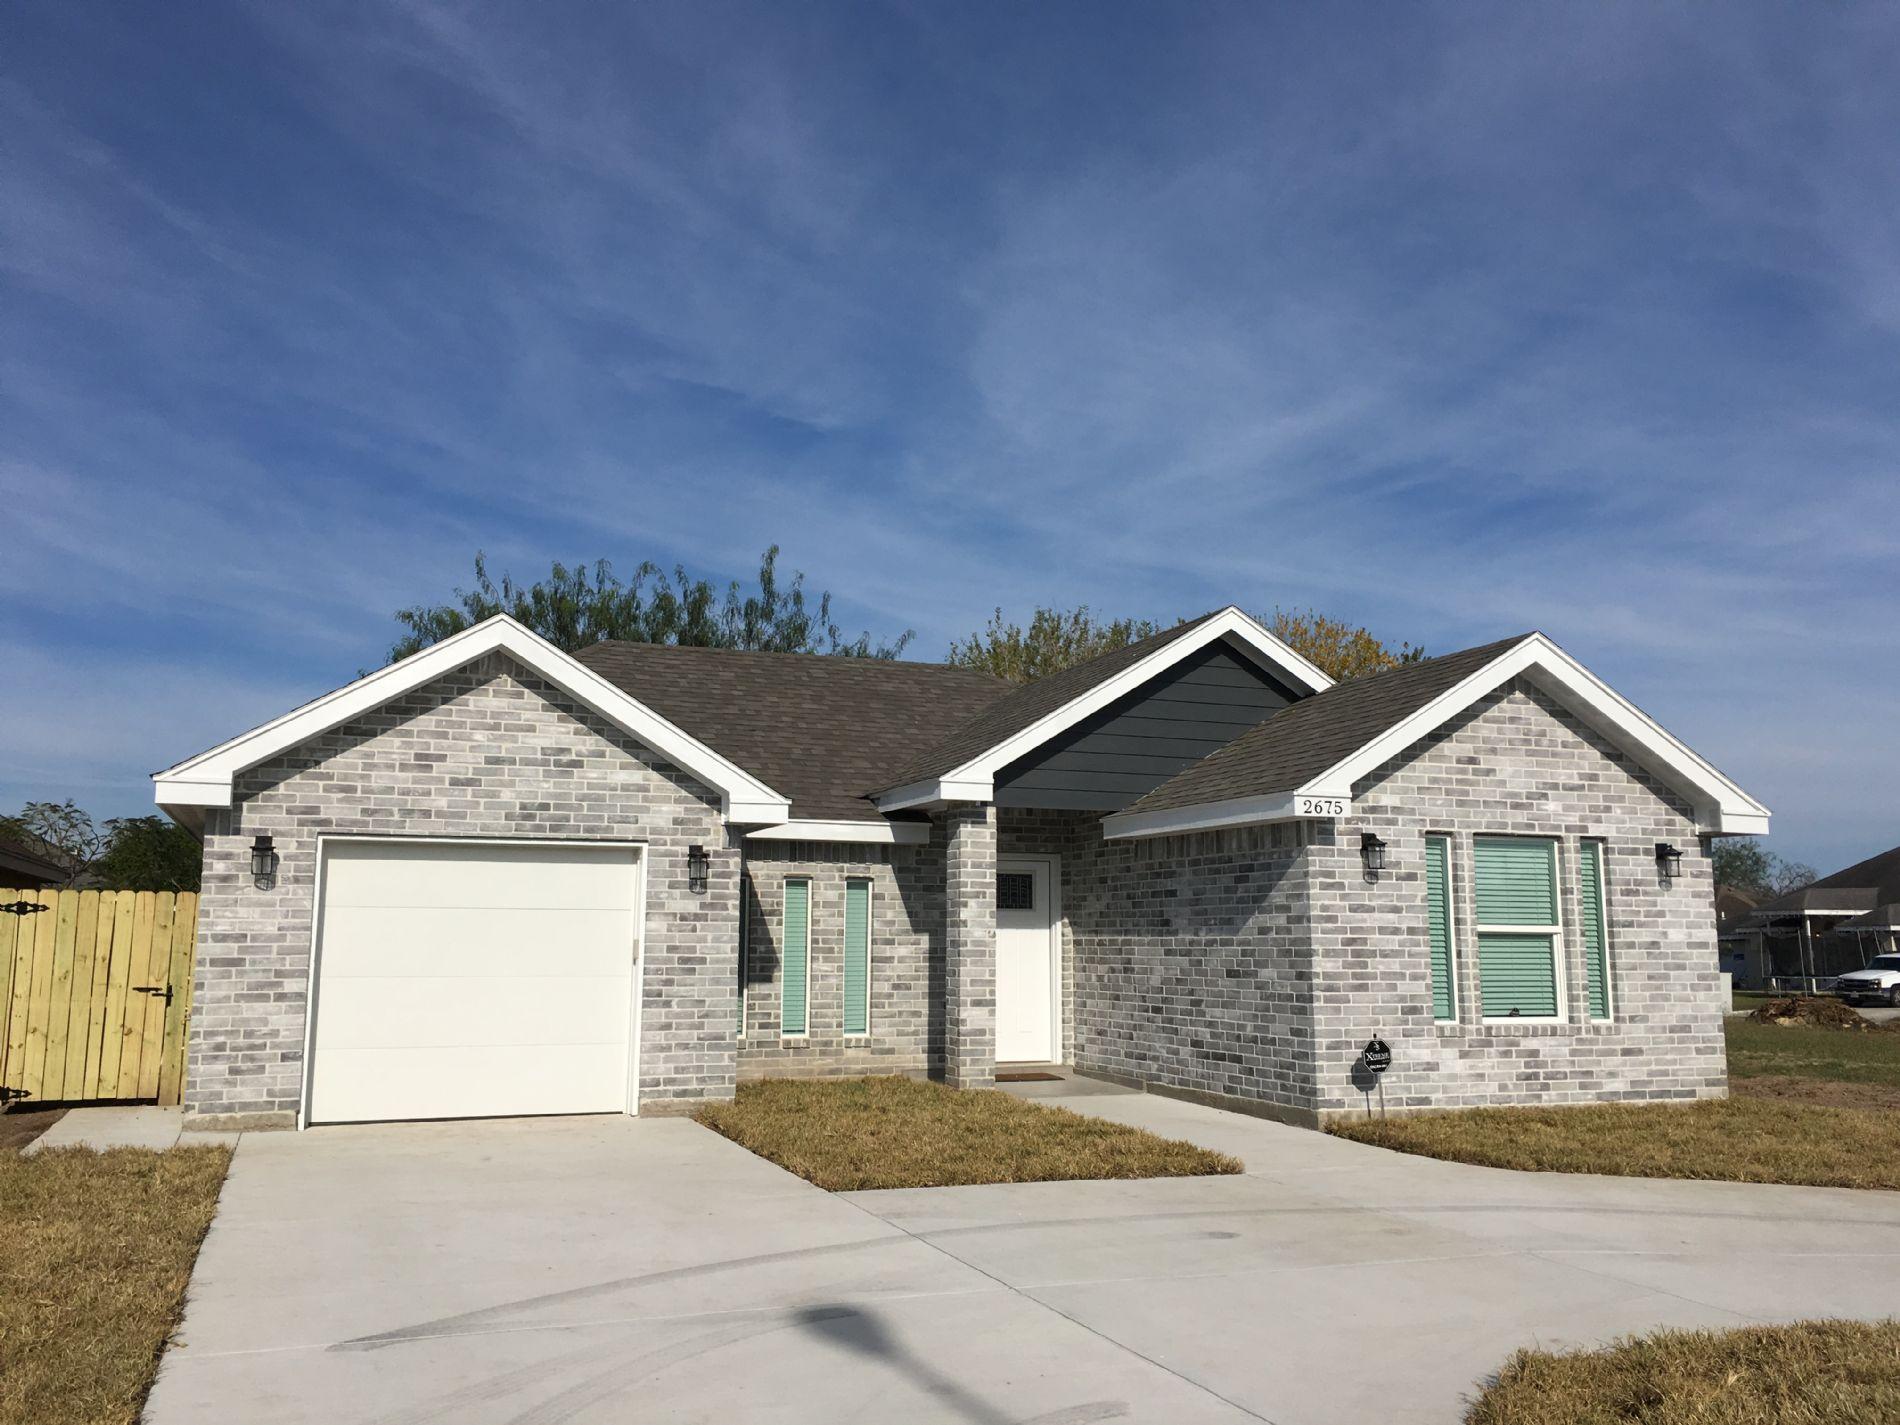 Beautiful New House 2675 Las Brisas Blvd Brownsville Tx 78520